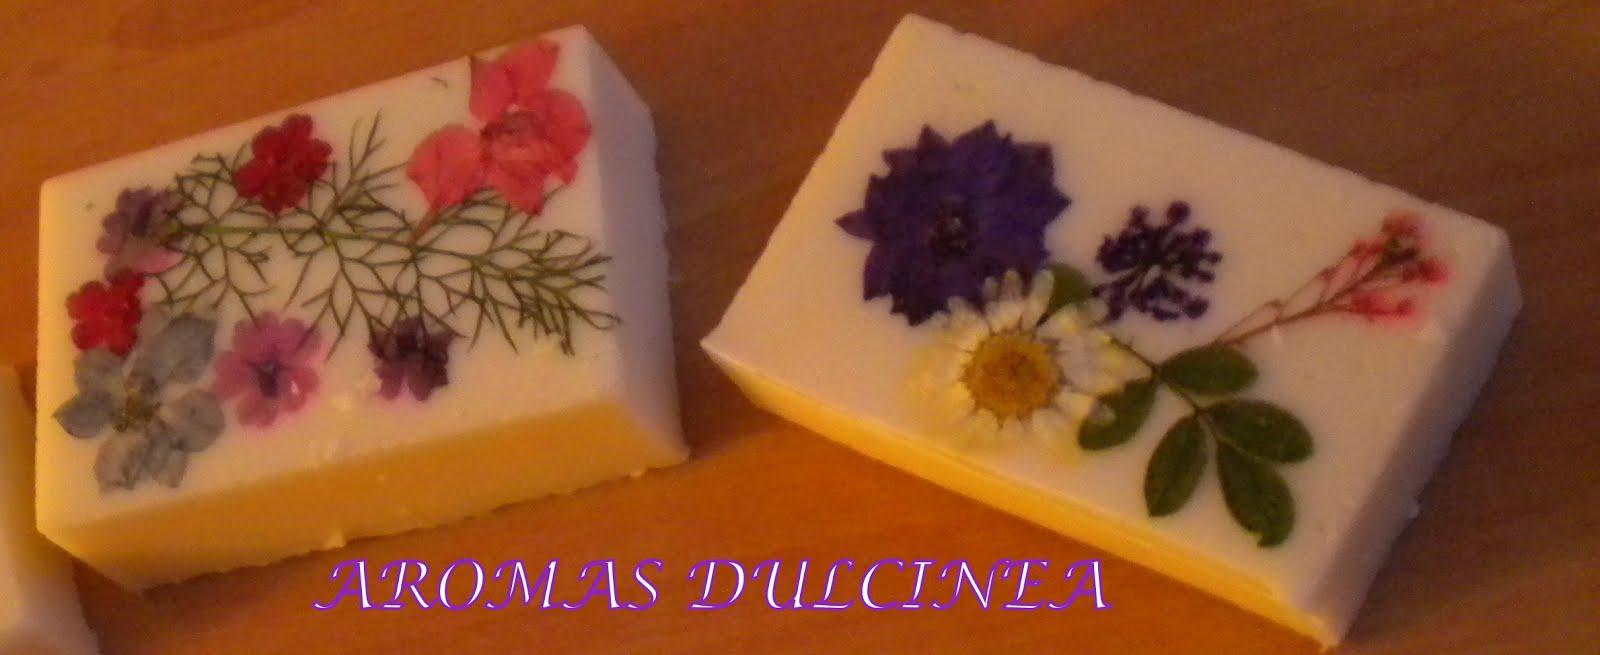 JABONES AROMAS DULCINEA